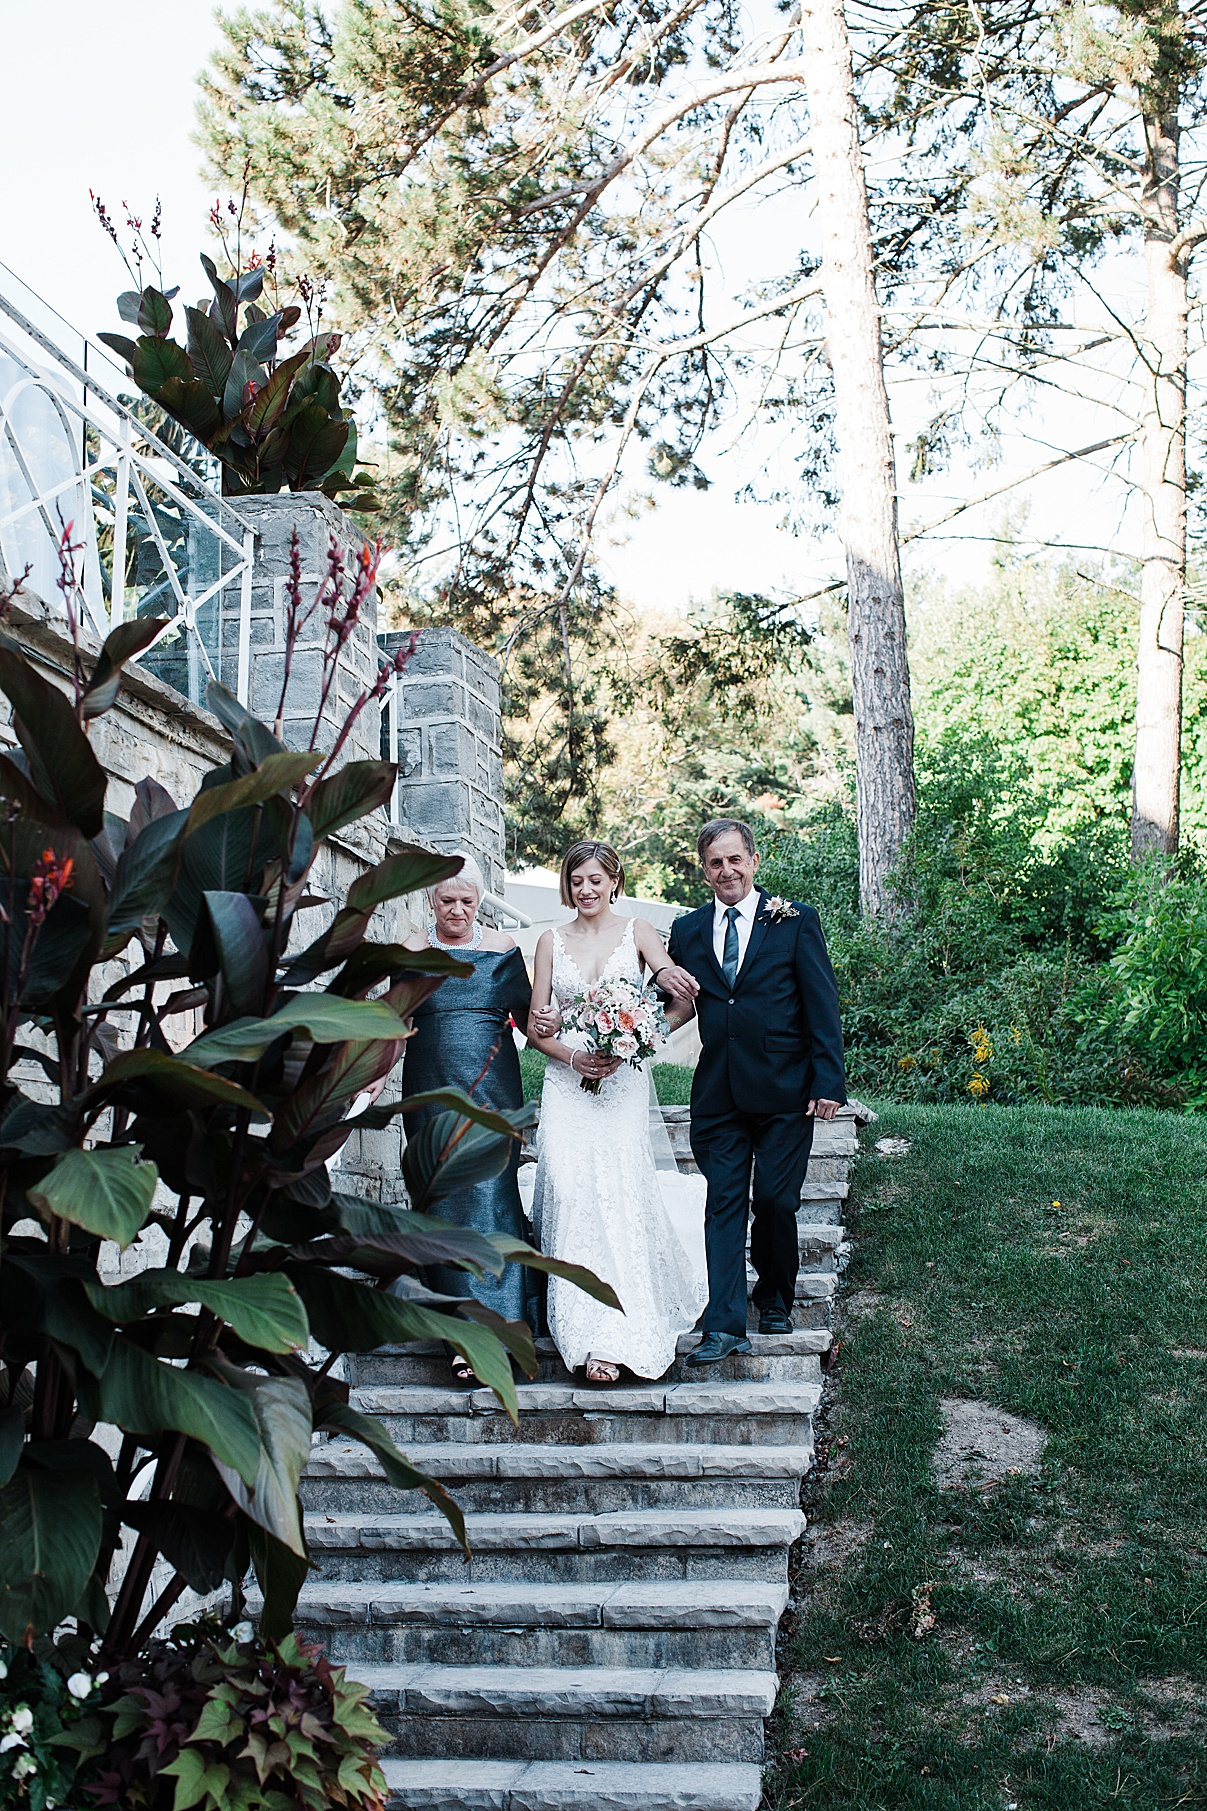 Bride walking down steps with parents| Harding Waterfront Estate Wedding| Ontario wedding photographer| Toronto wedding photographer| 3 Photography | 3photography.ca